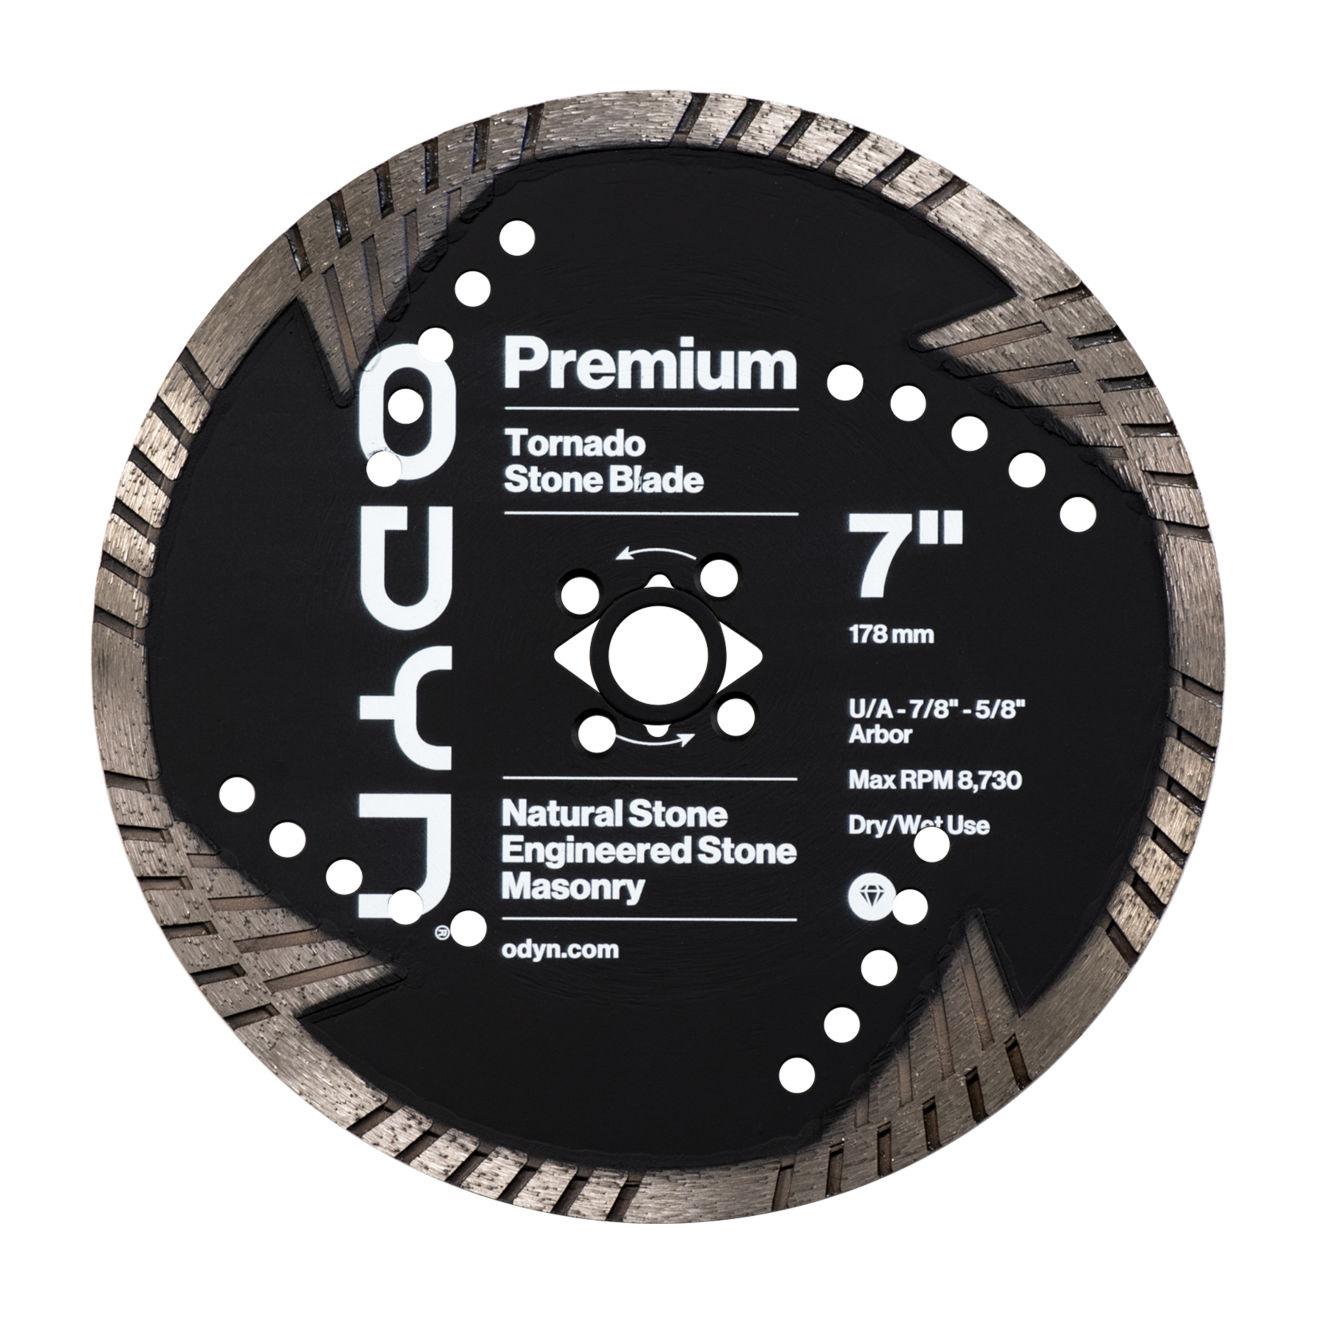 Odyn 7 in. Premium Tornado Stone Blade